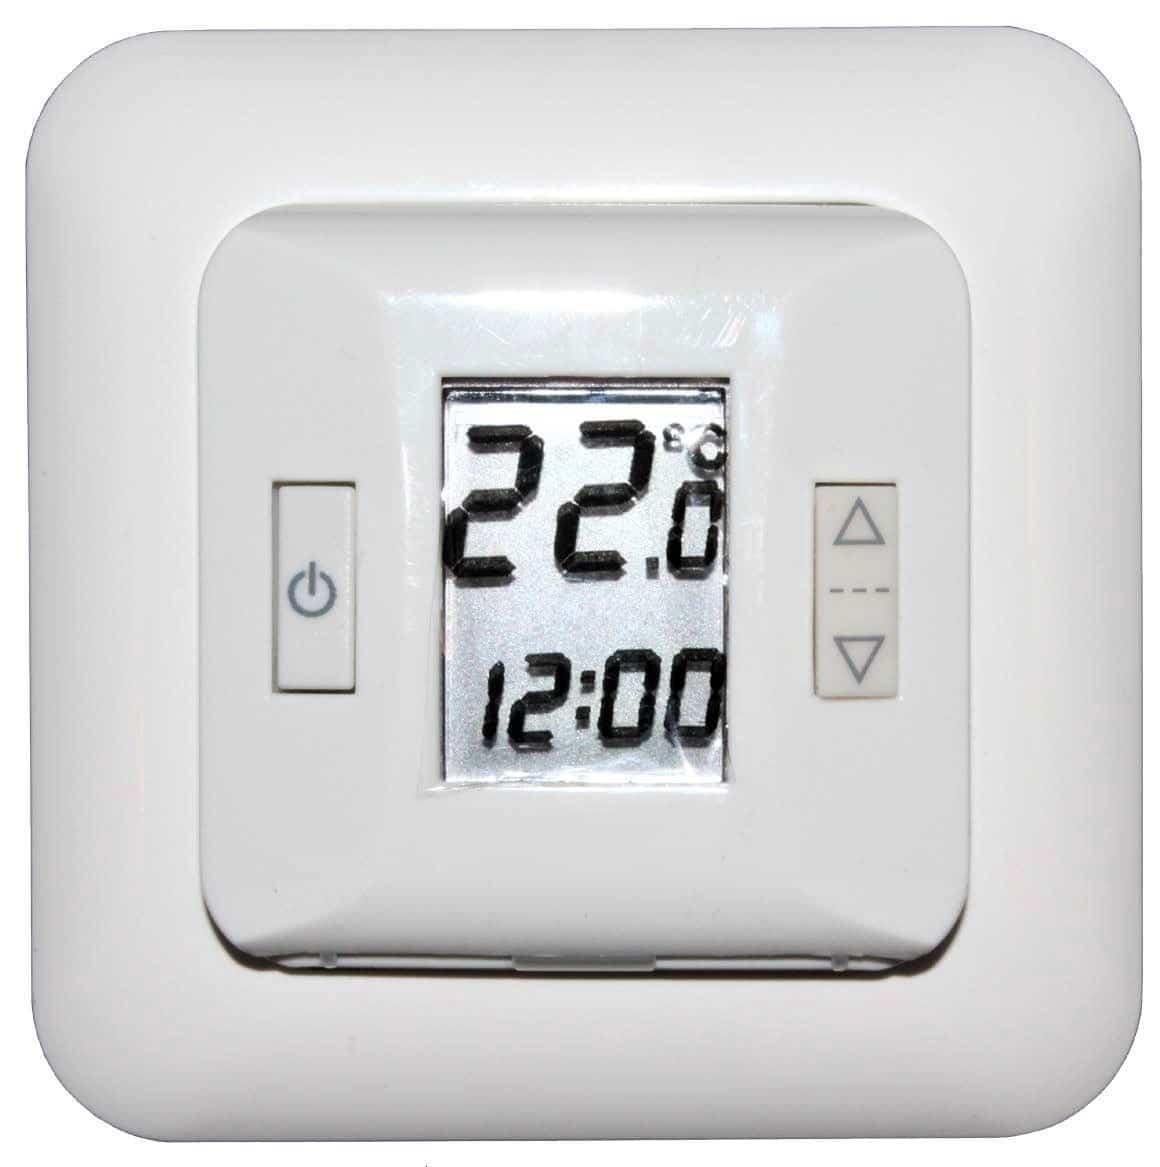 Elektrilise põrandakütte termostaat